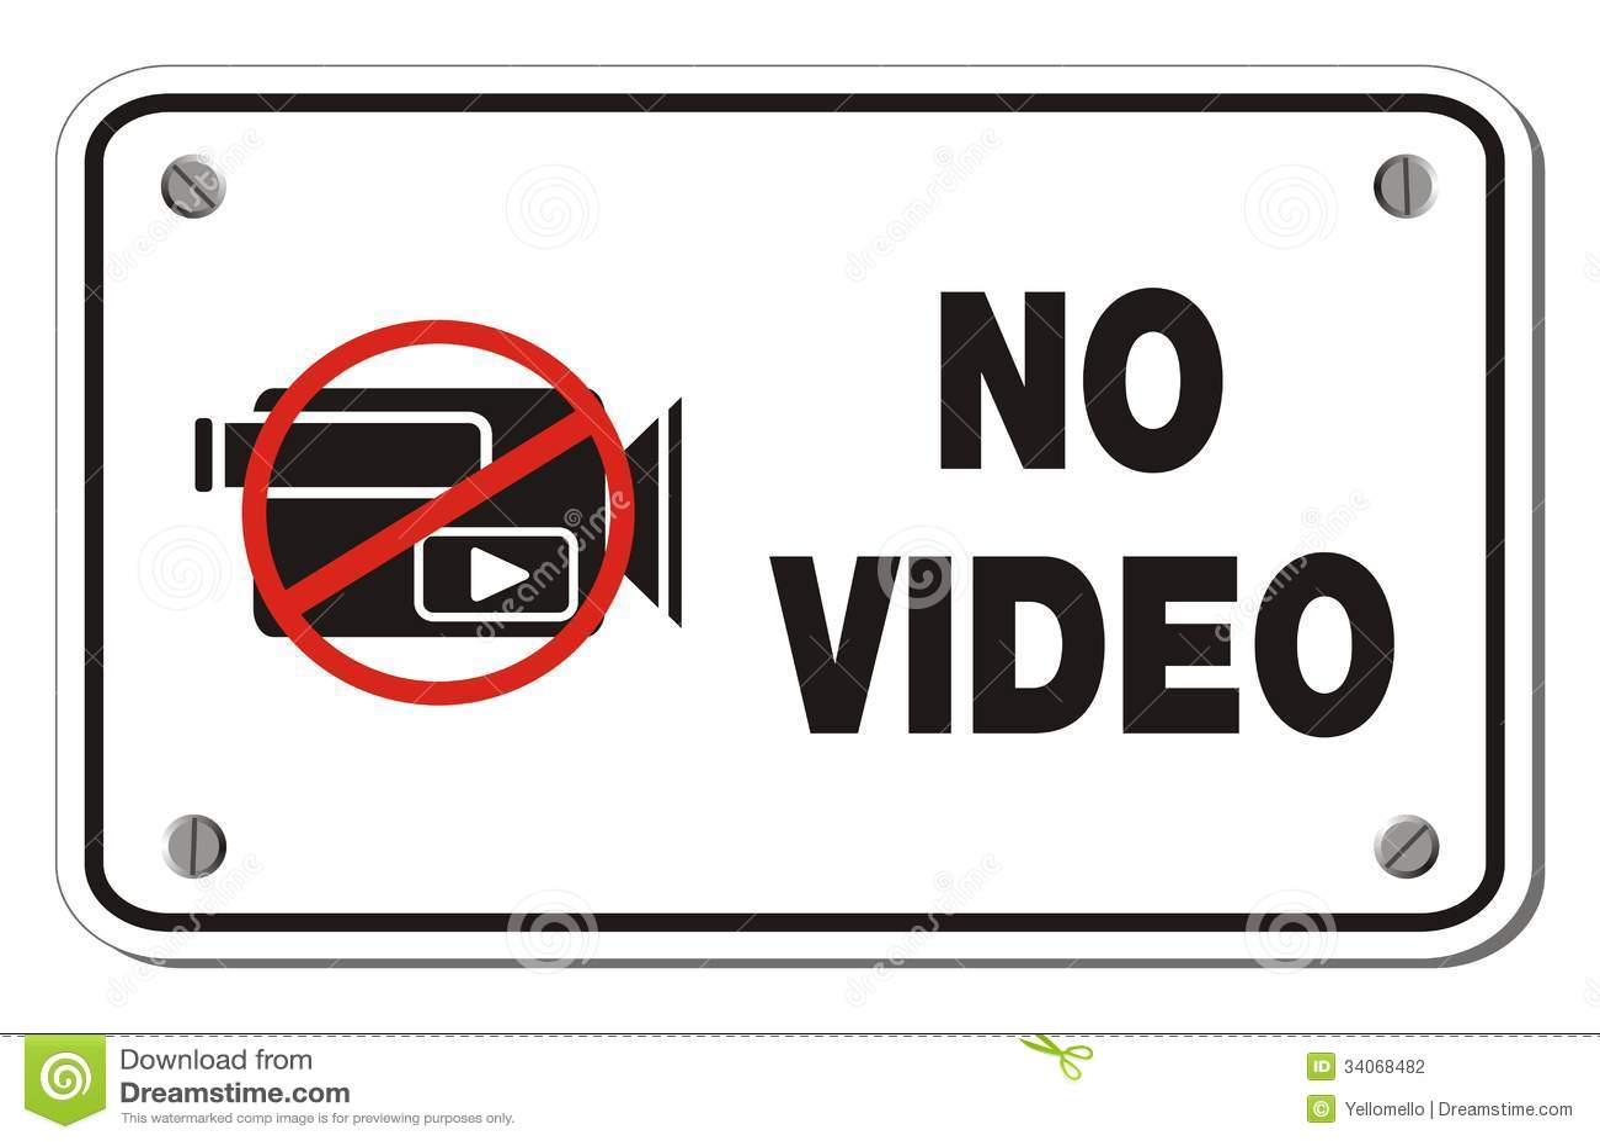 No video images 64